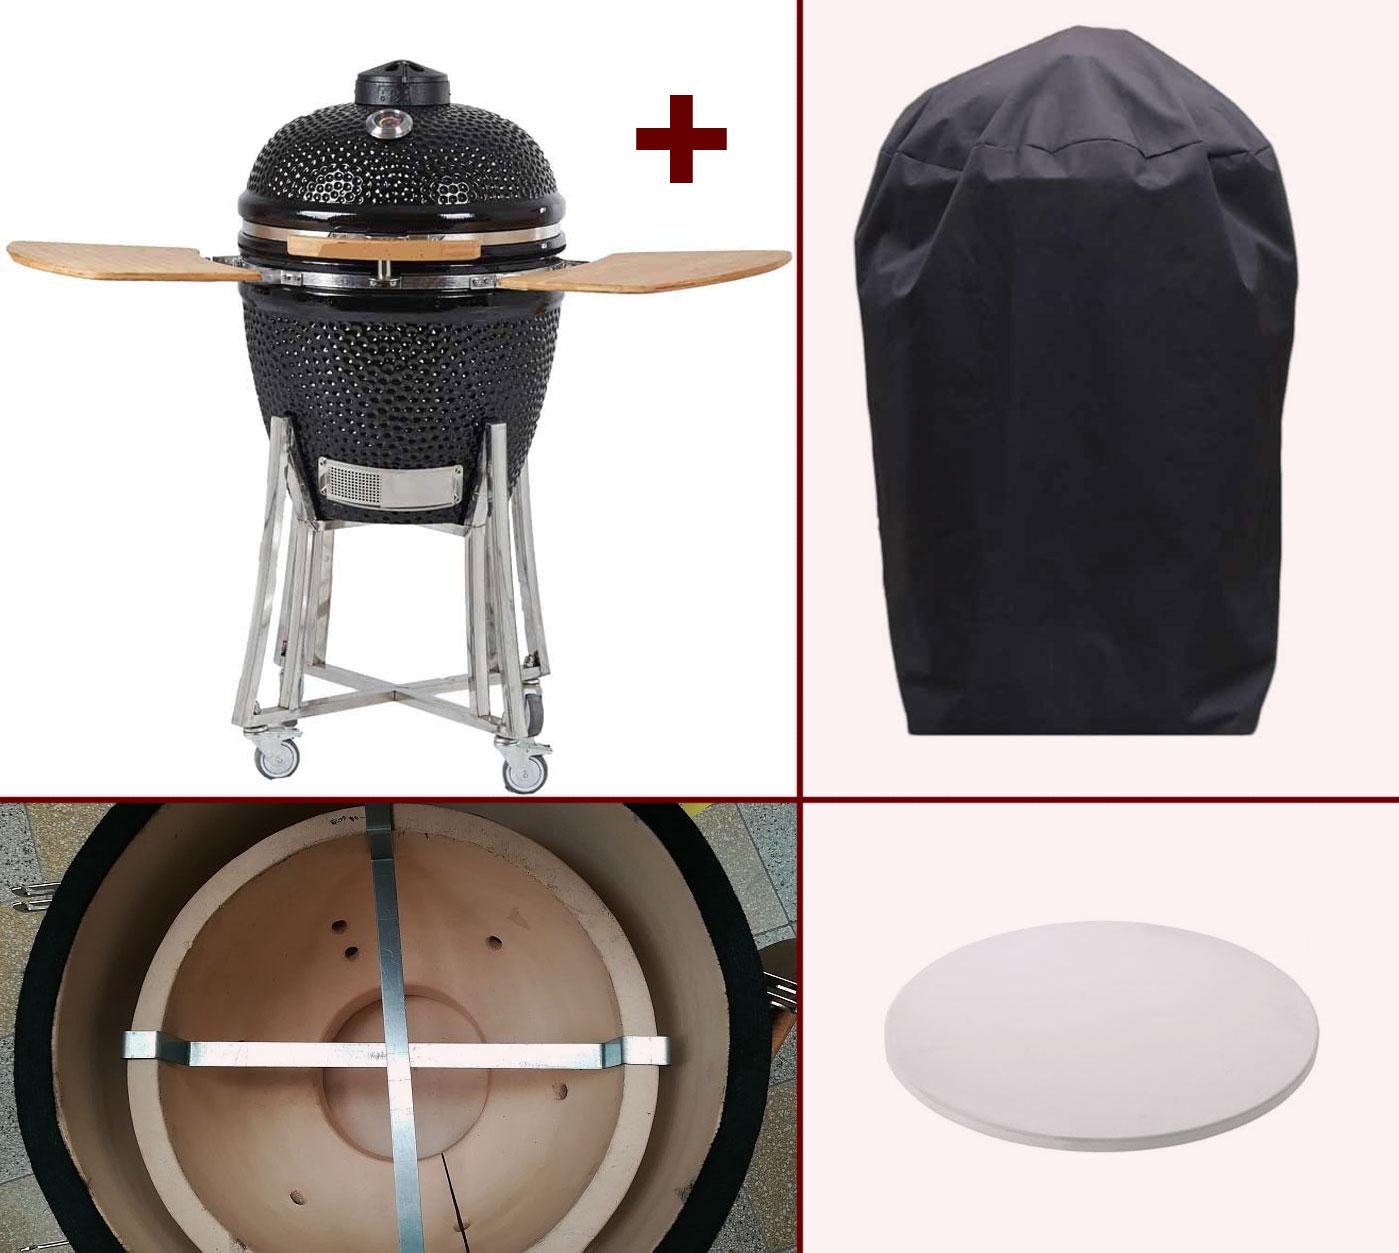 "Kamado-Kitchen Keramikgrill de Luxe 18,8"" Ø48cm schwarz Set Bild 1"